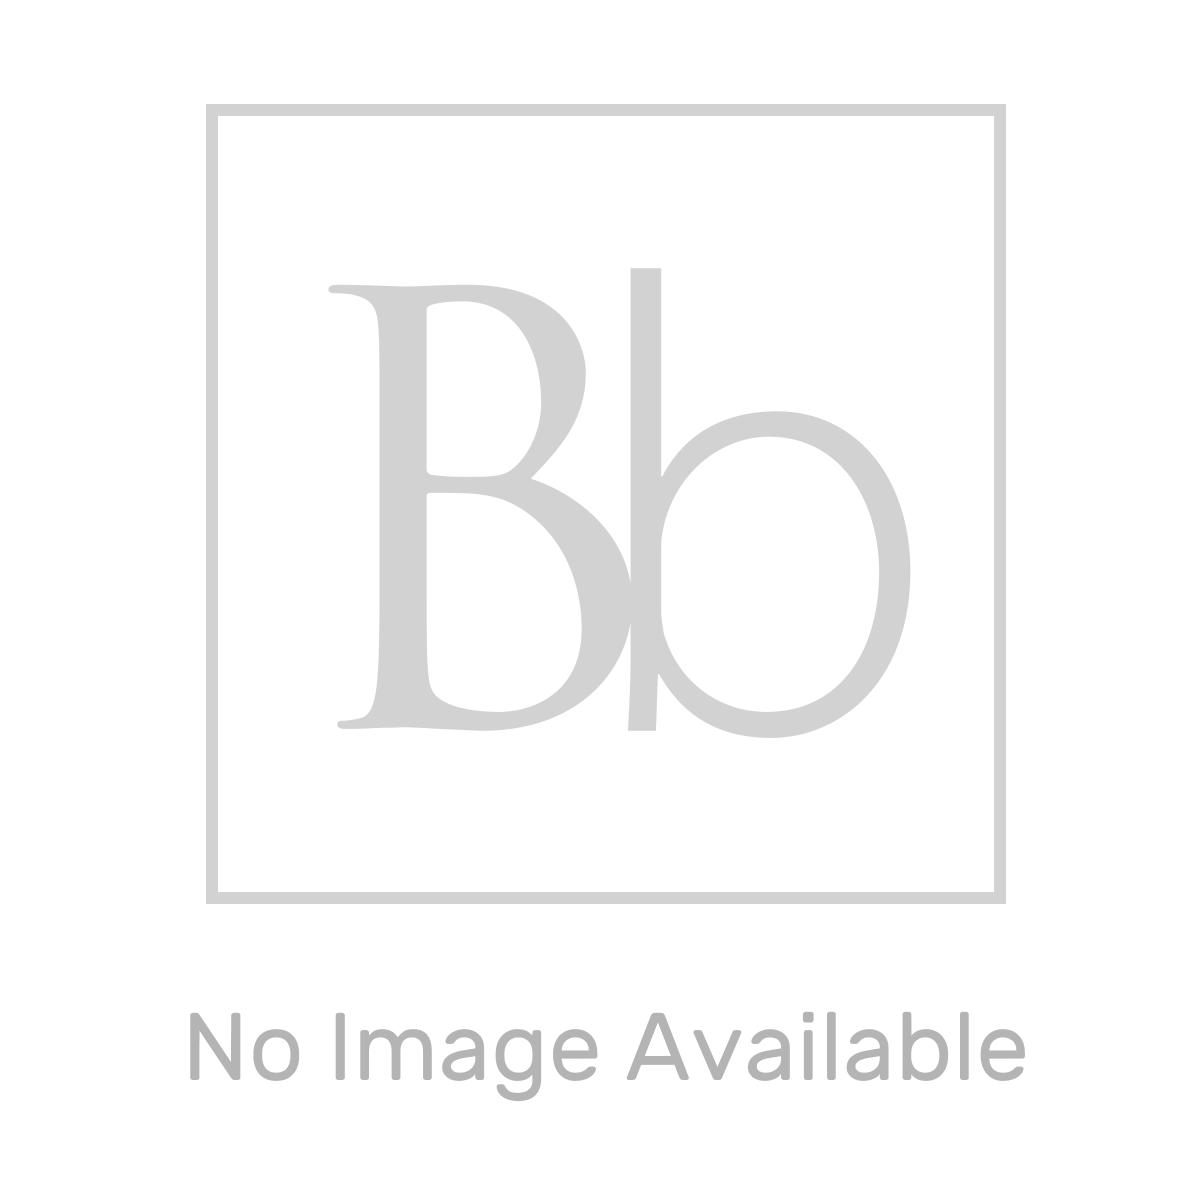 Moods Plain White Acrylic Bath Panel 1400 / 1500mm